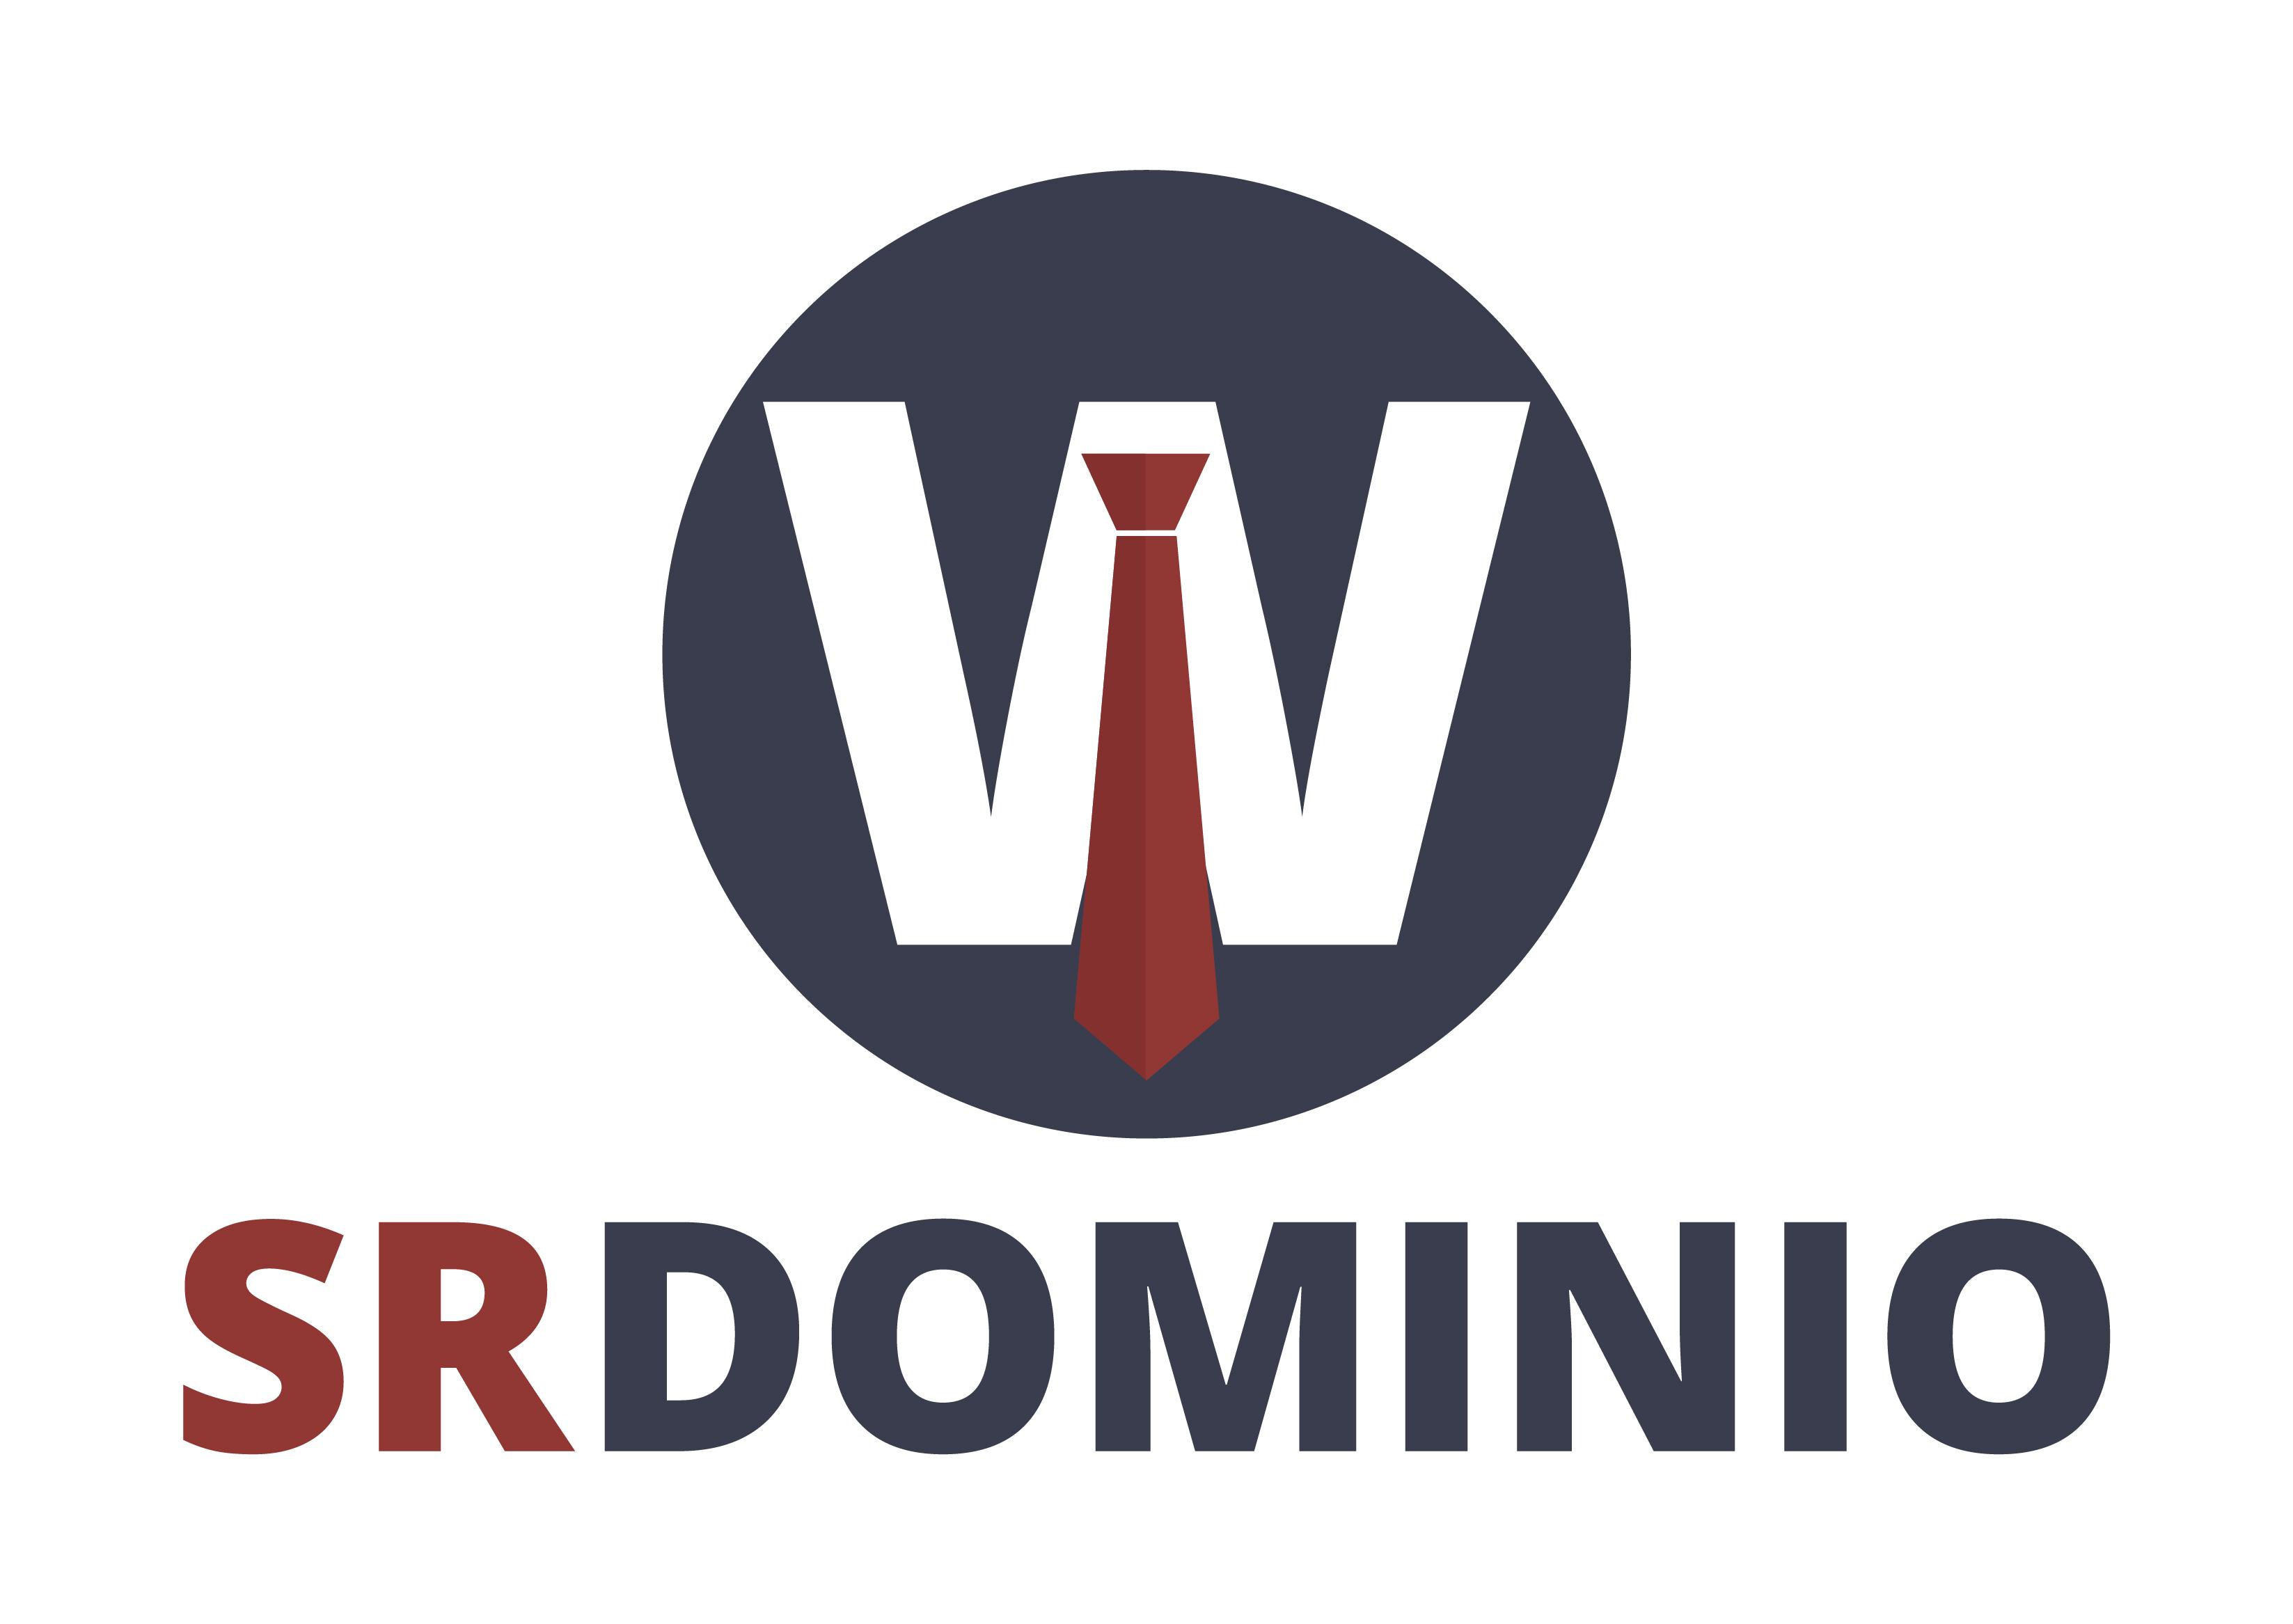 SrDominio.com